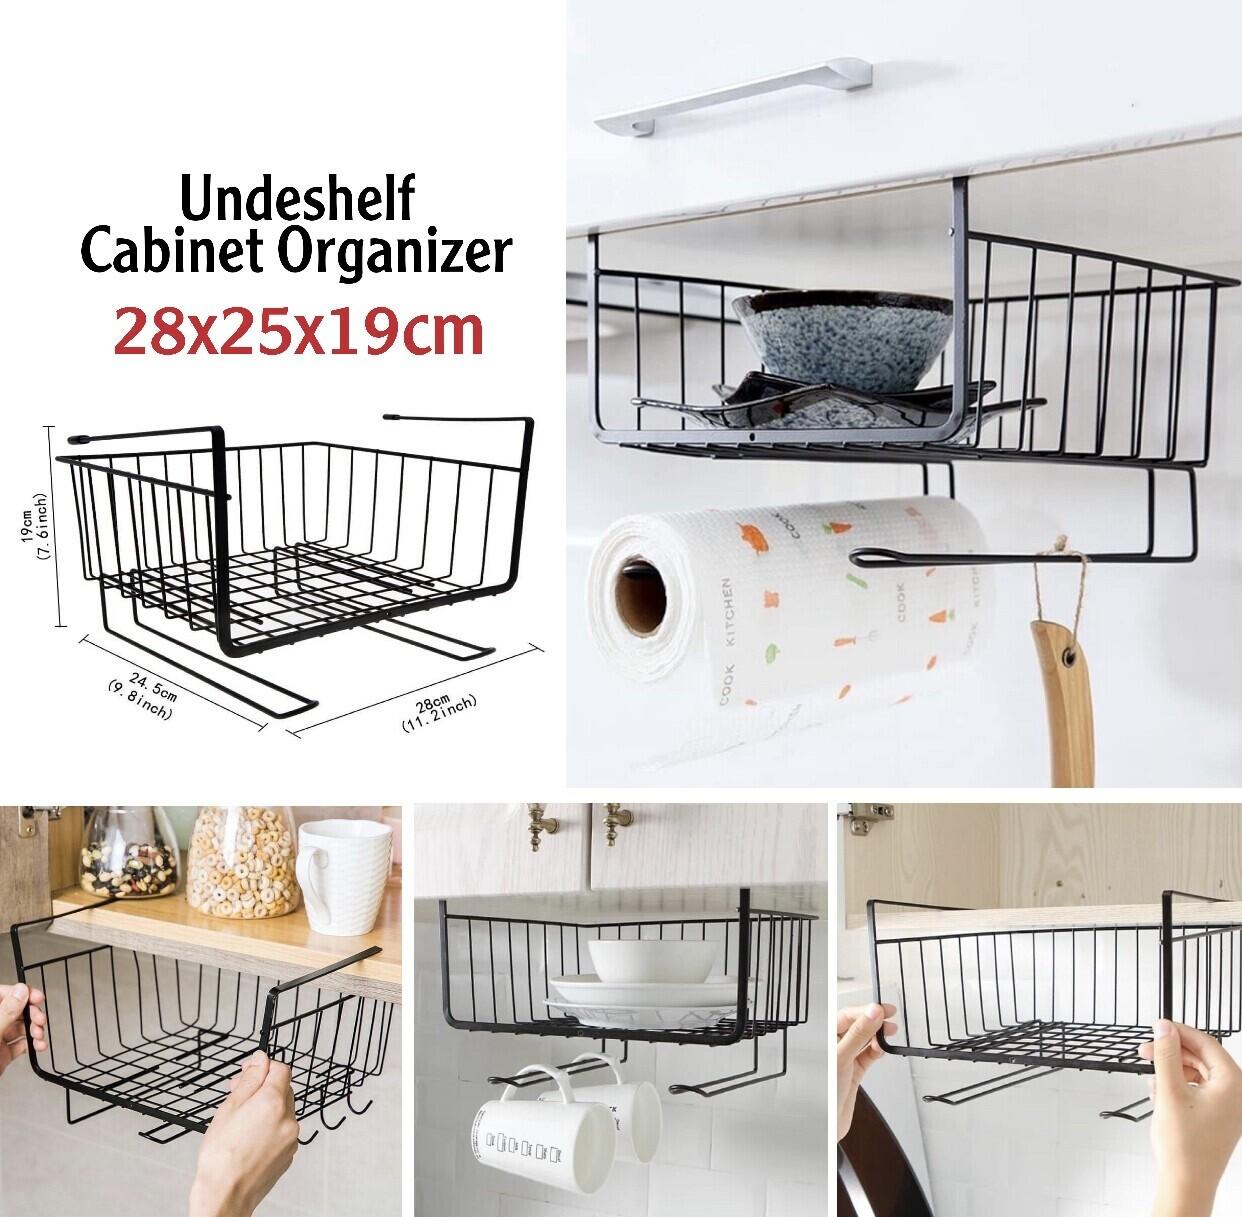 Cabinet Undershelf (28x25x19cm)